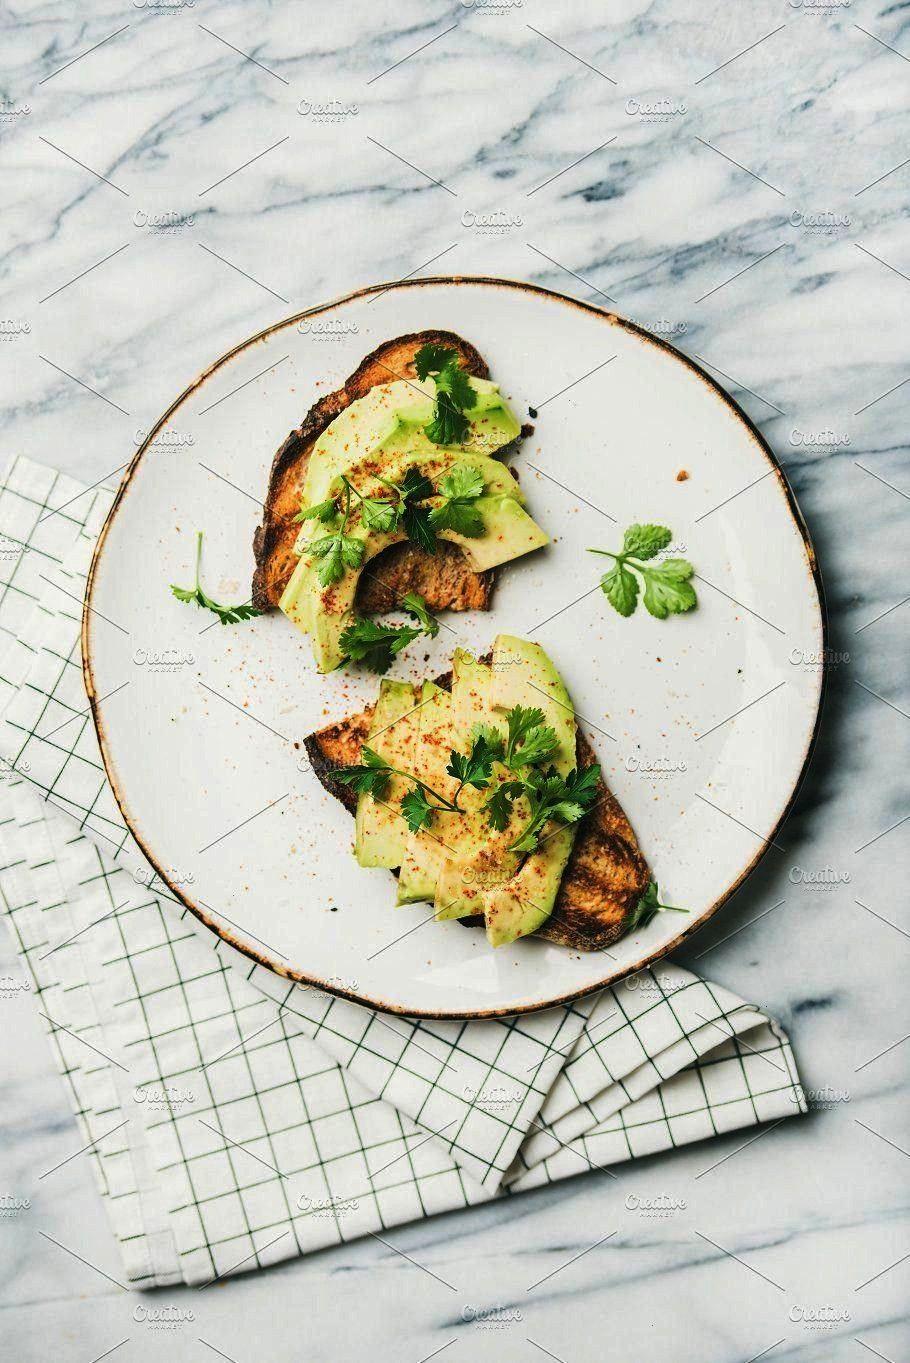 avocado toast over marble background top view Healthy vegan breakfast or lunch Flatl Flatlay of avocado toast over marble background top view Healthy vegan breakfast or l...